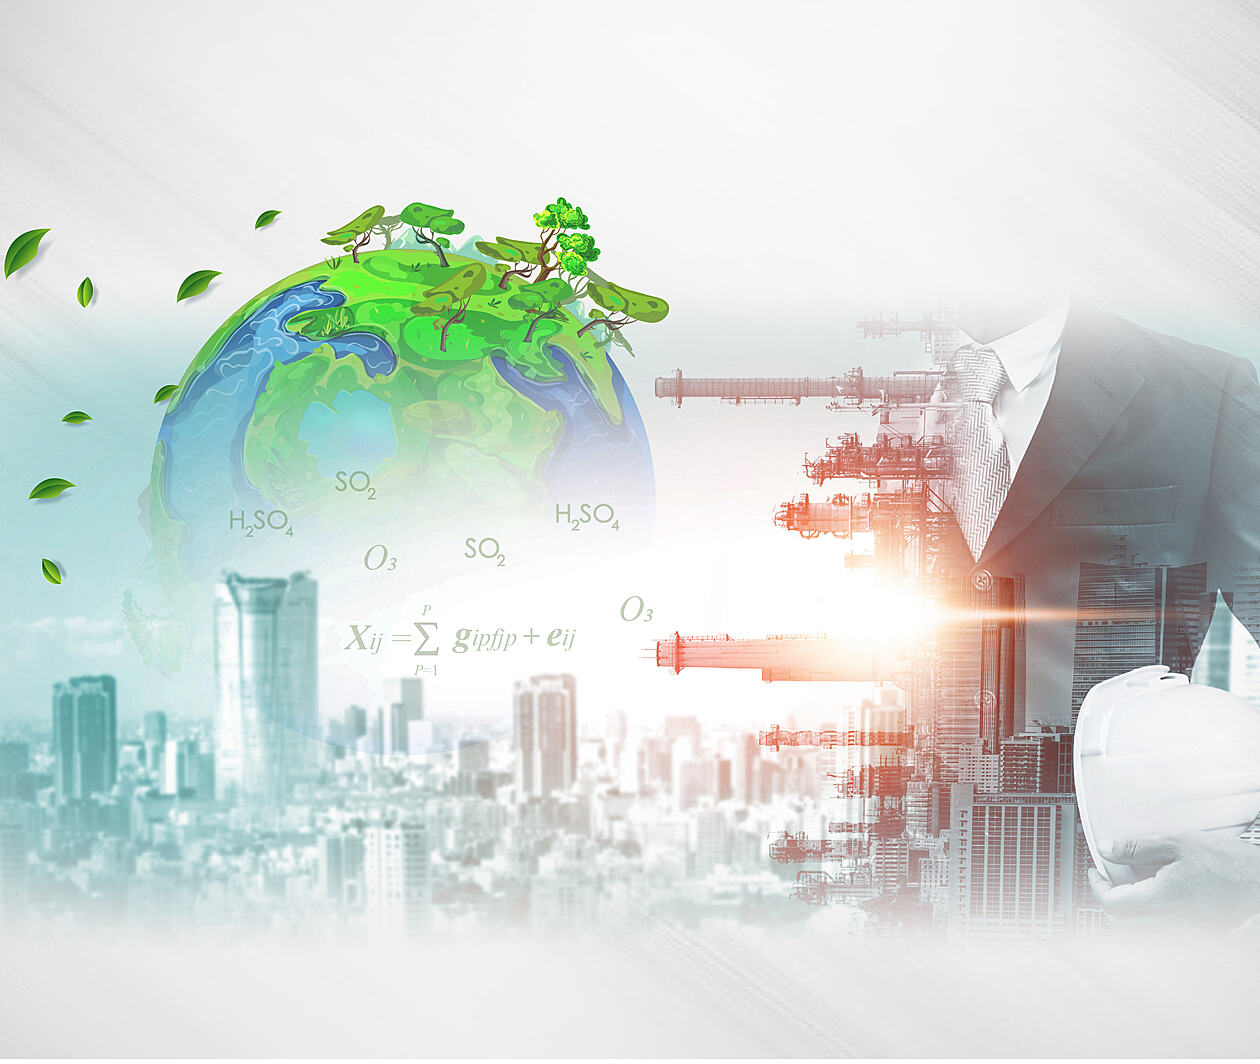 Chemometrics in Air Pollution